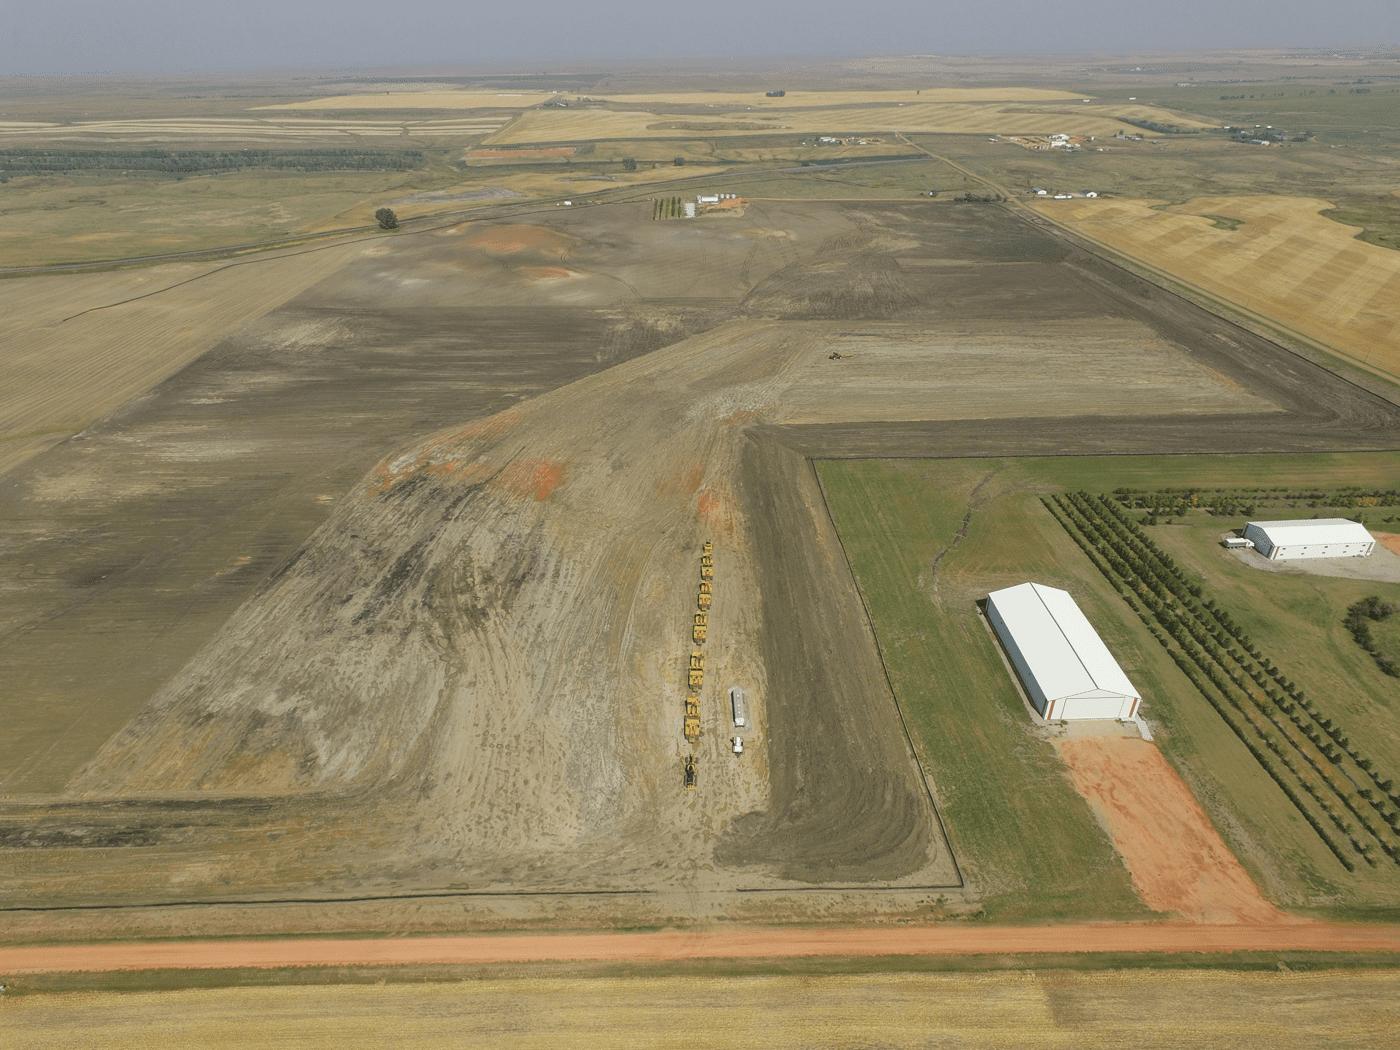 Davis Refinery site - 700 acres - North Dakota